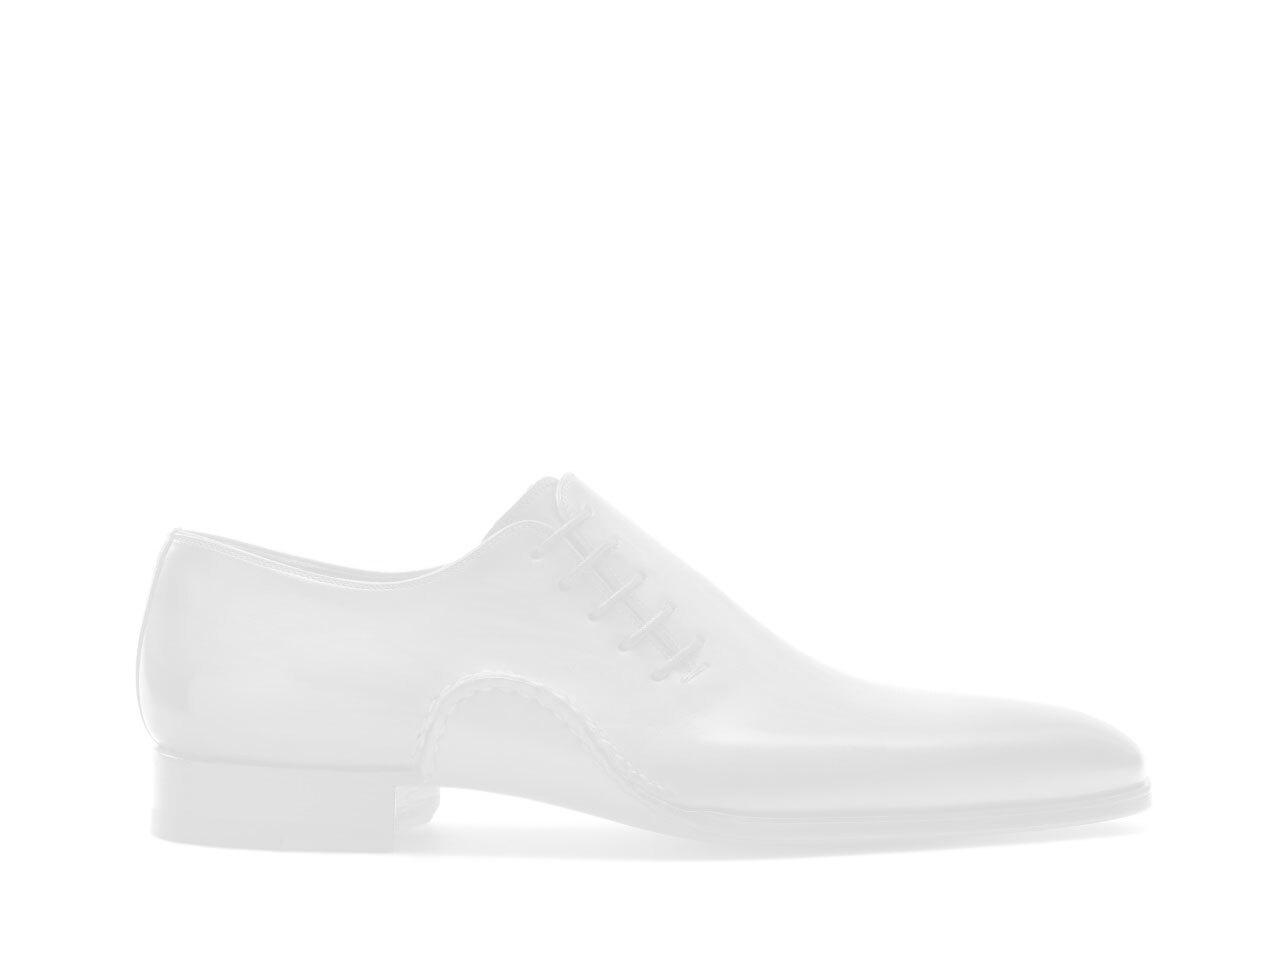 Side view of the Magnanni Kenton Grafito Men's Double Monk Strap Shoes